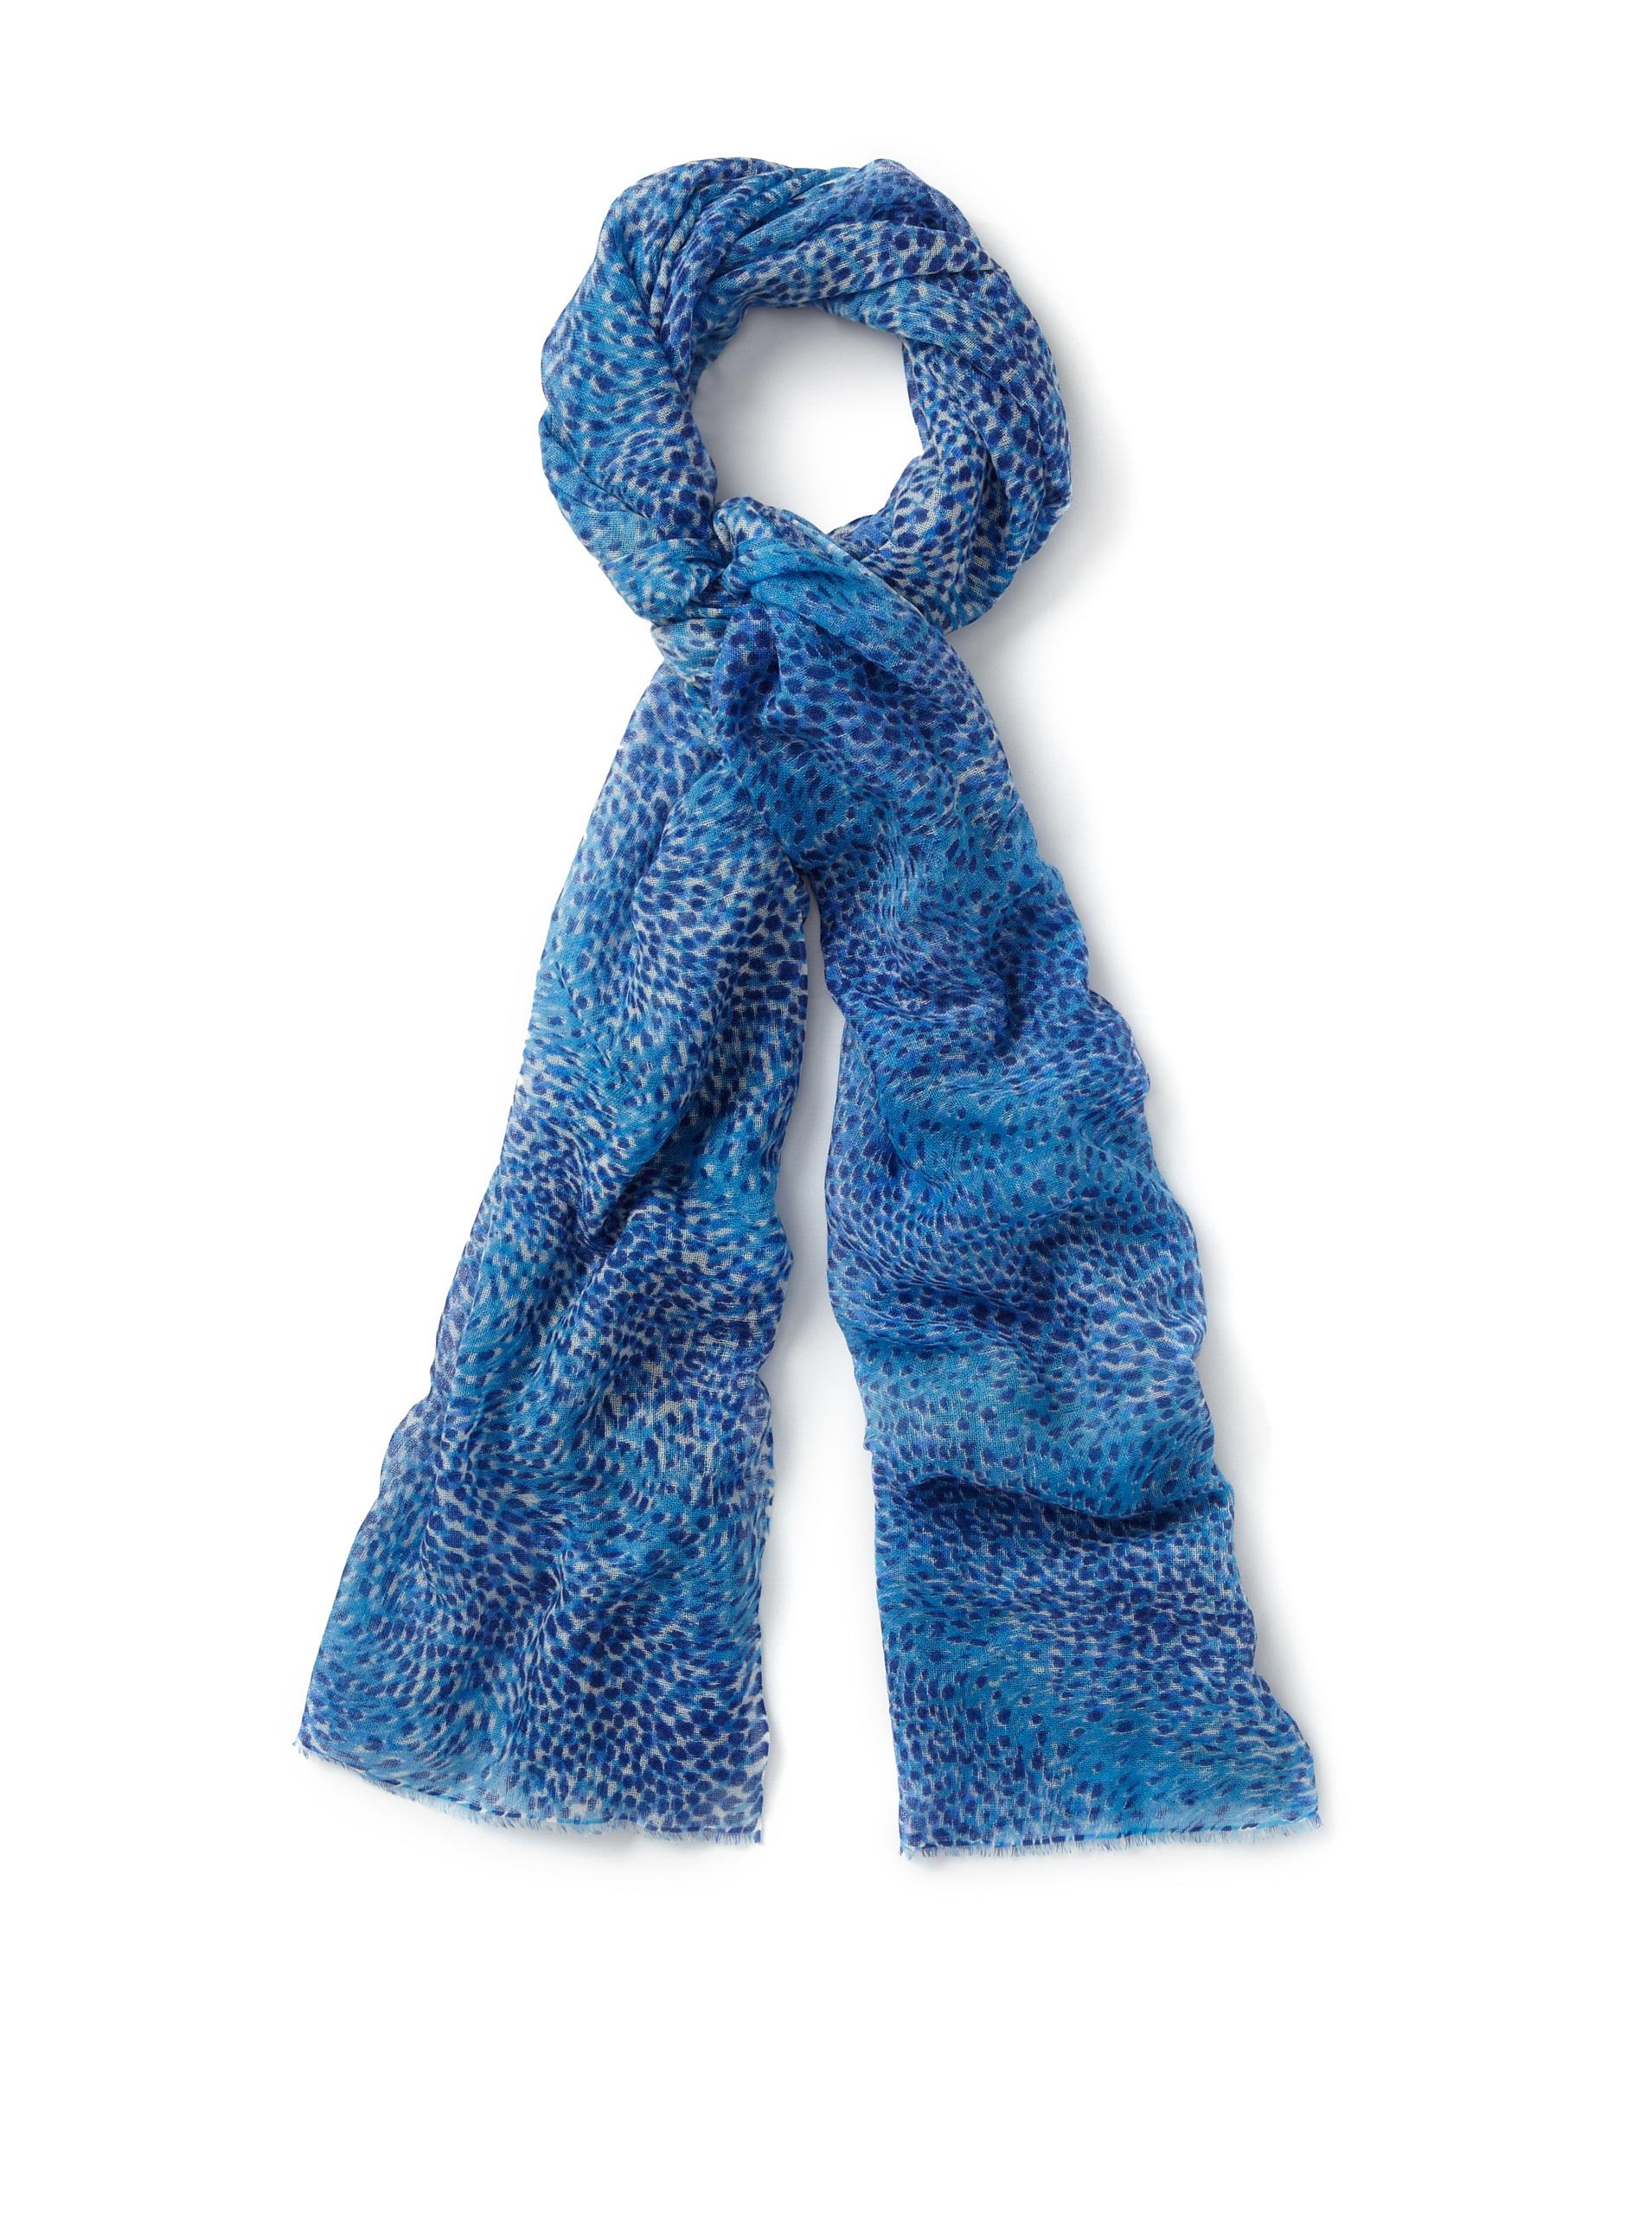 Bajra Scarves Women's Blue Animal Print Scarf (Blue)